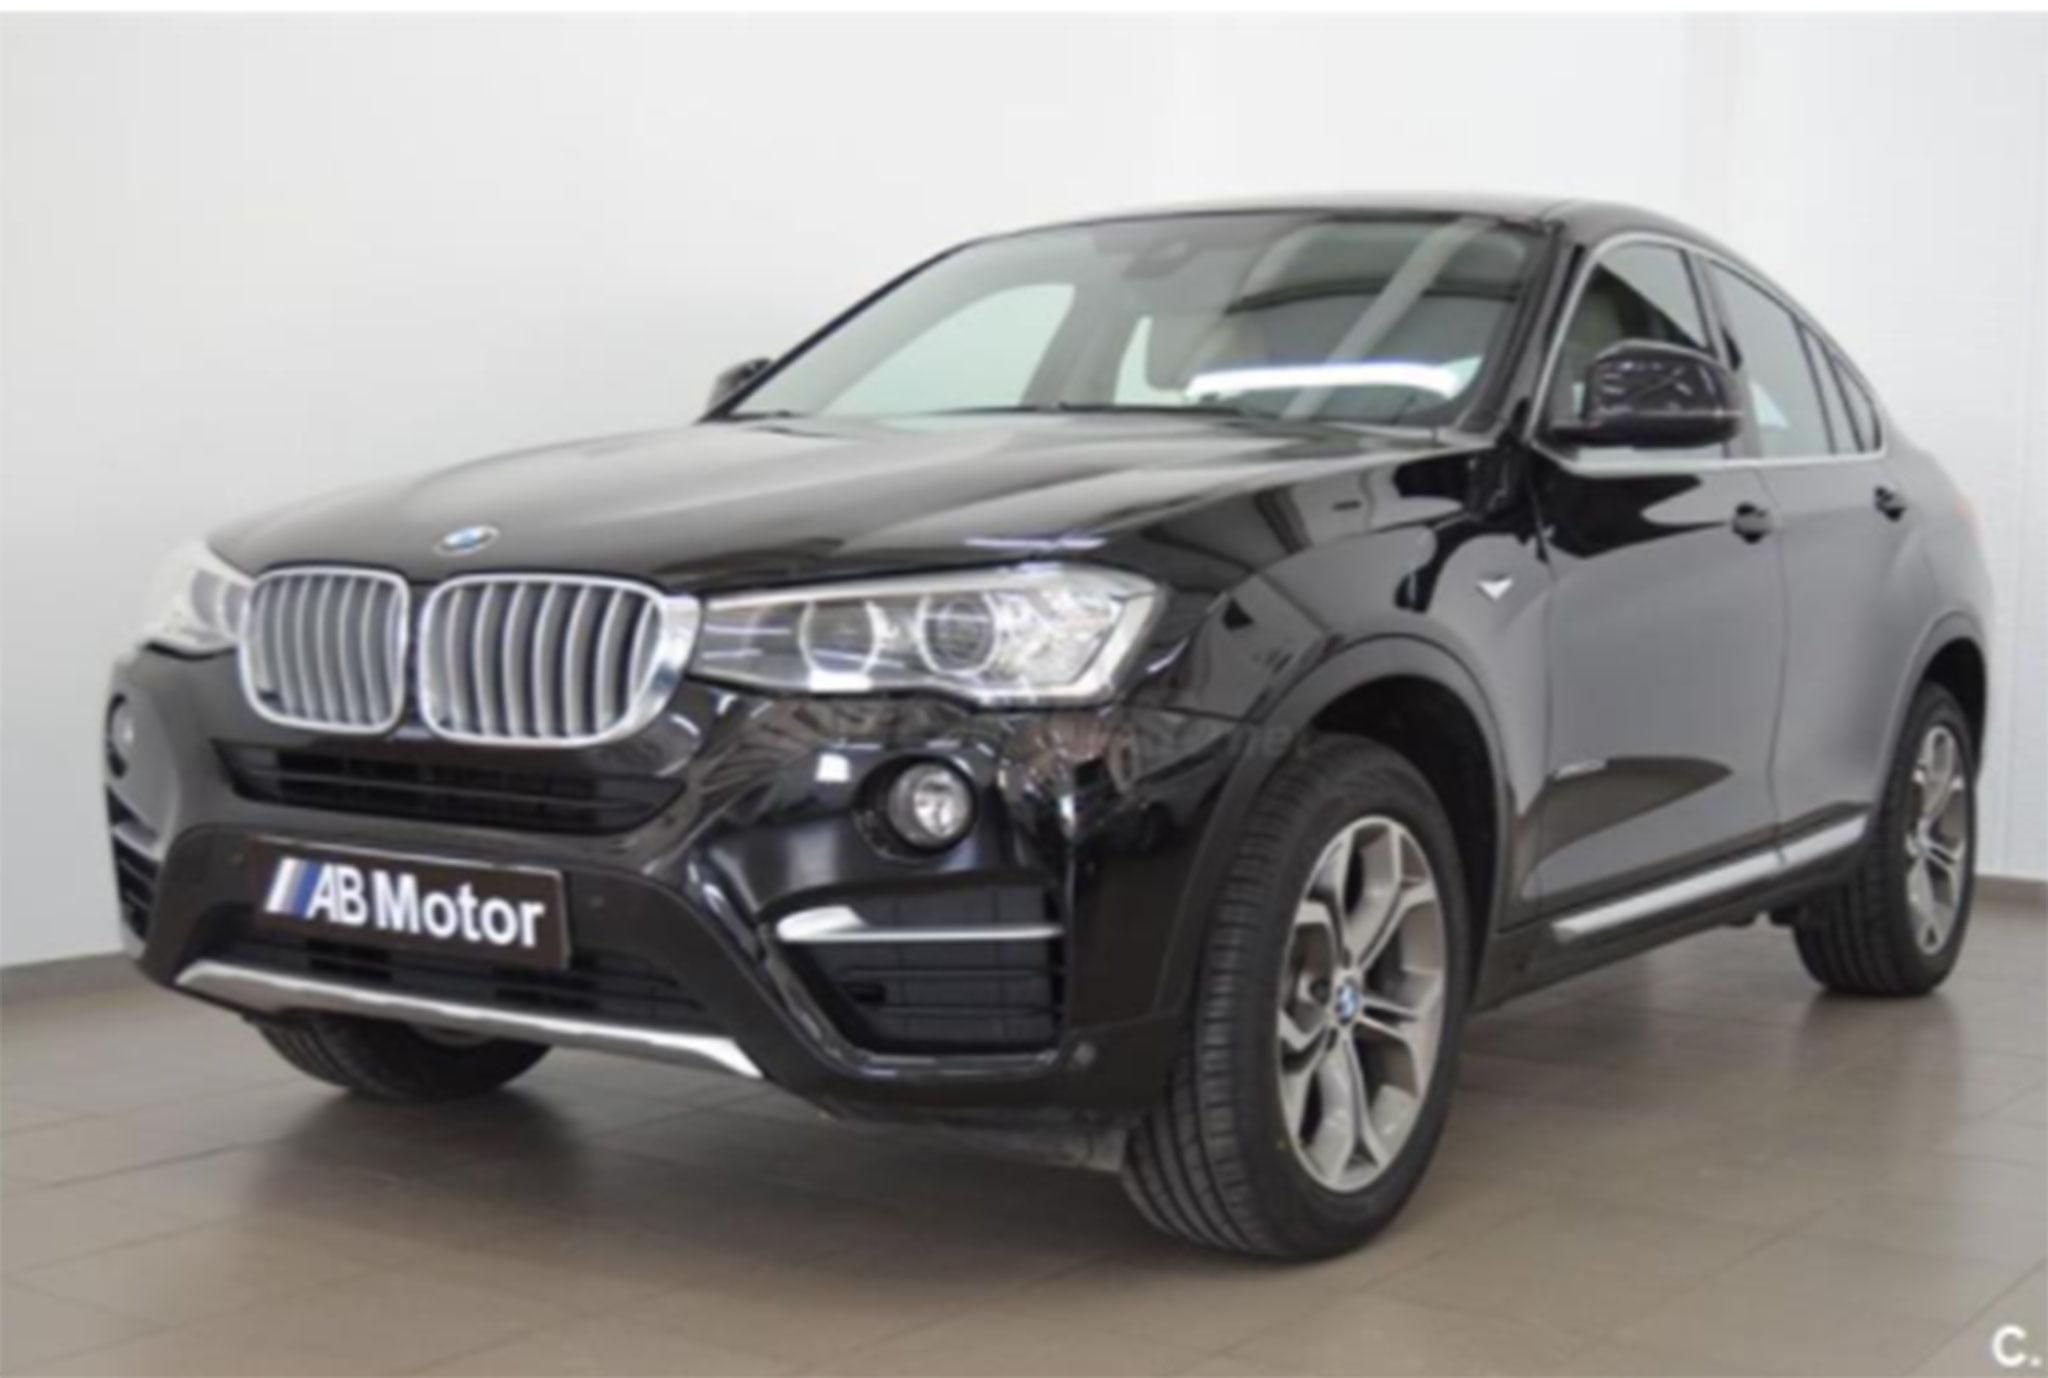 BMW X4 xDrive20d 5p. – AB Motor